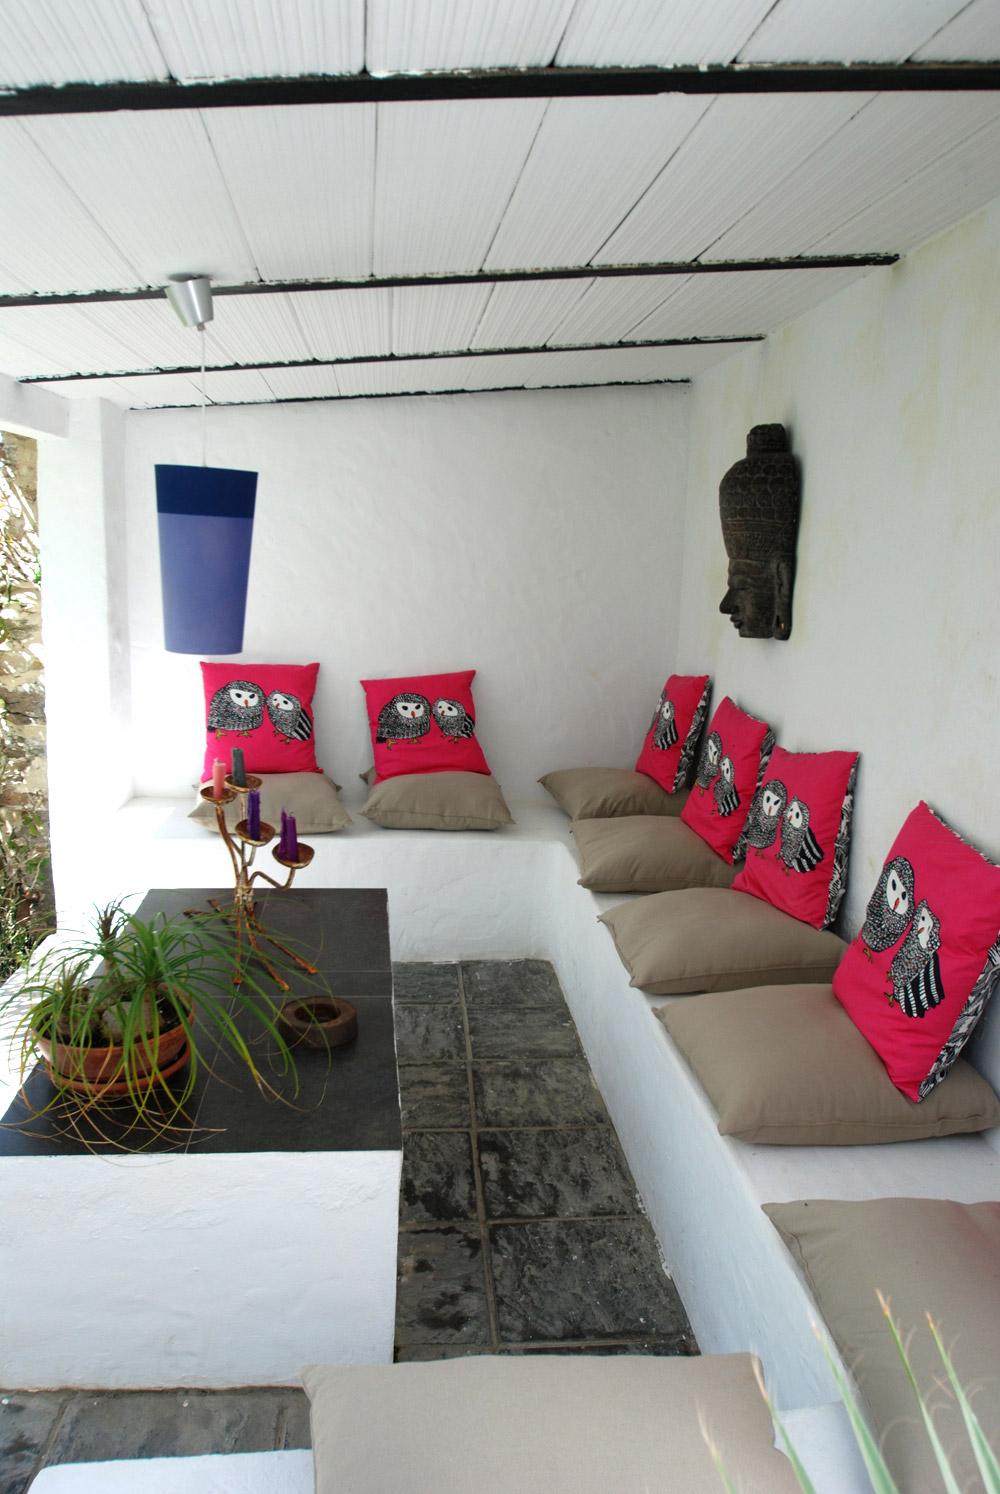 Sofas baratos en cadiz casa la siesta cadiz spain with sofas baratos en cadiz sof ramse beig m - Merkamueble sofas cheslong ...